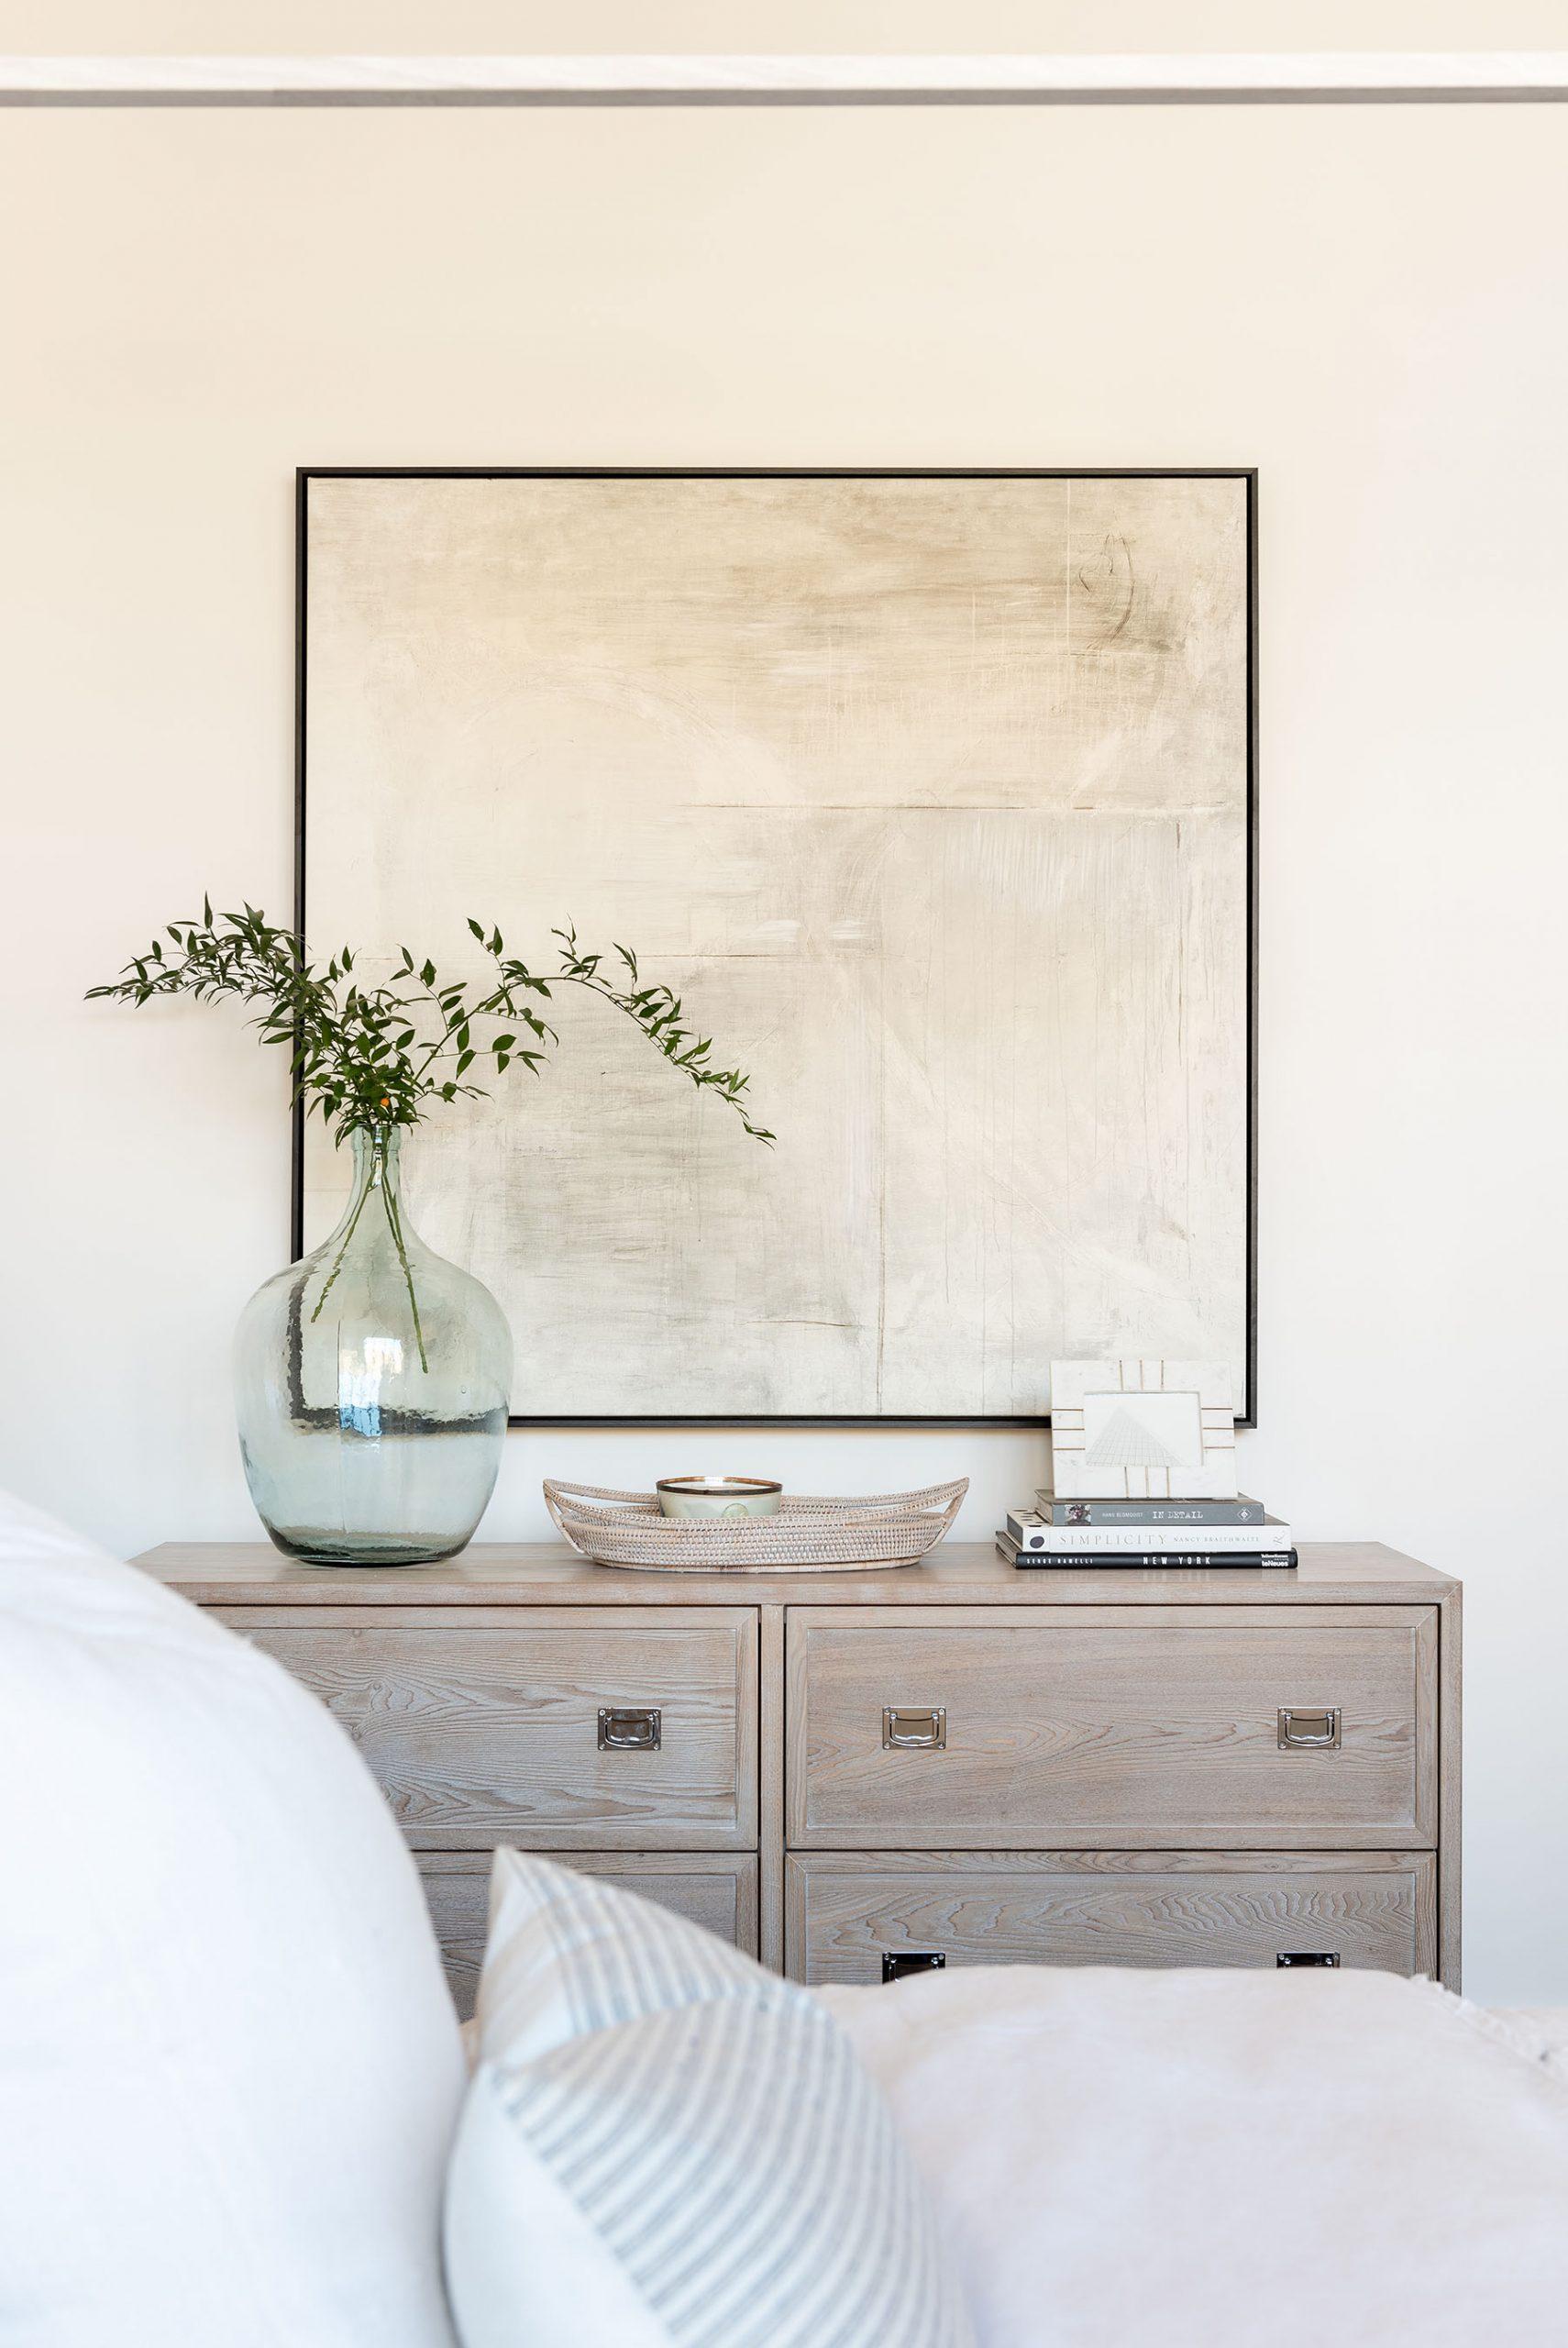 7 Small Bedroom Design Tips